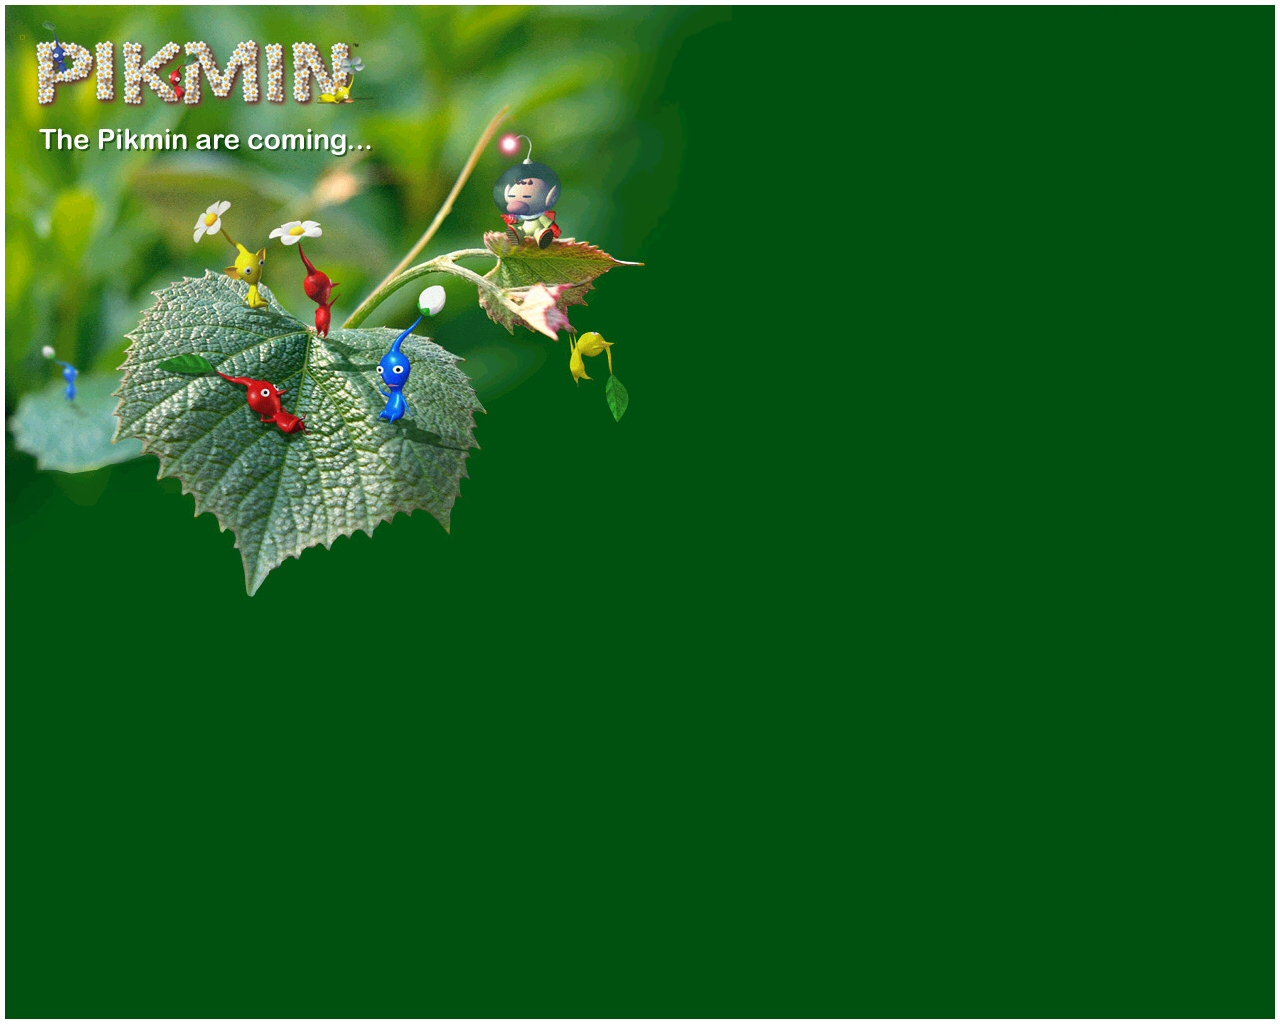 Pikmin HD Wallpaper 14   1280 X 1024 stmednet 1280x1024